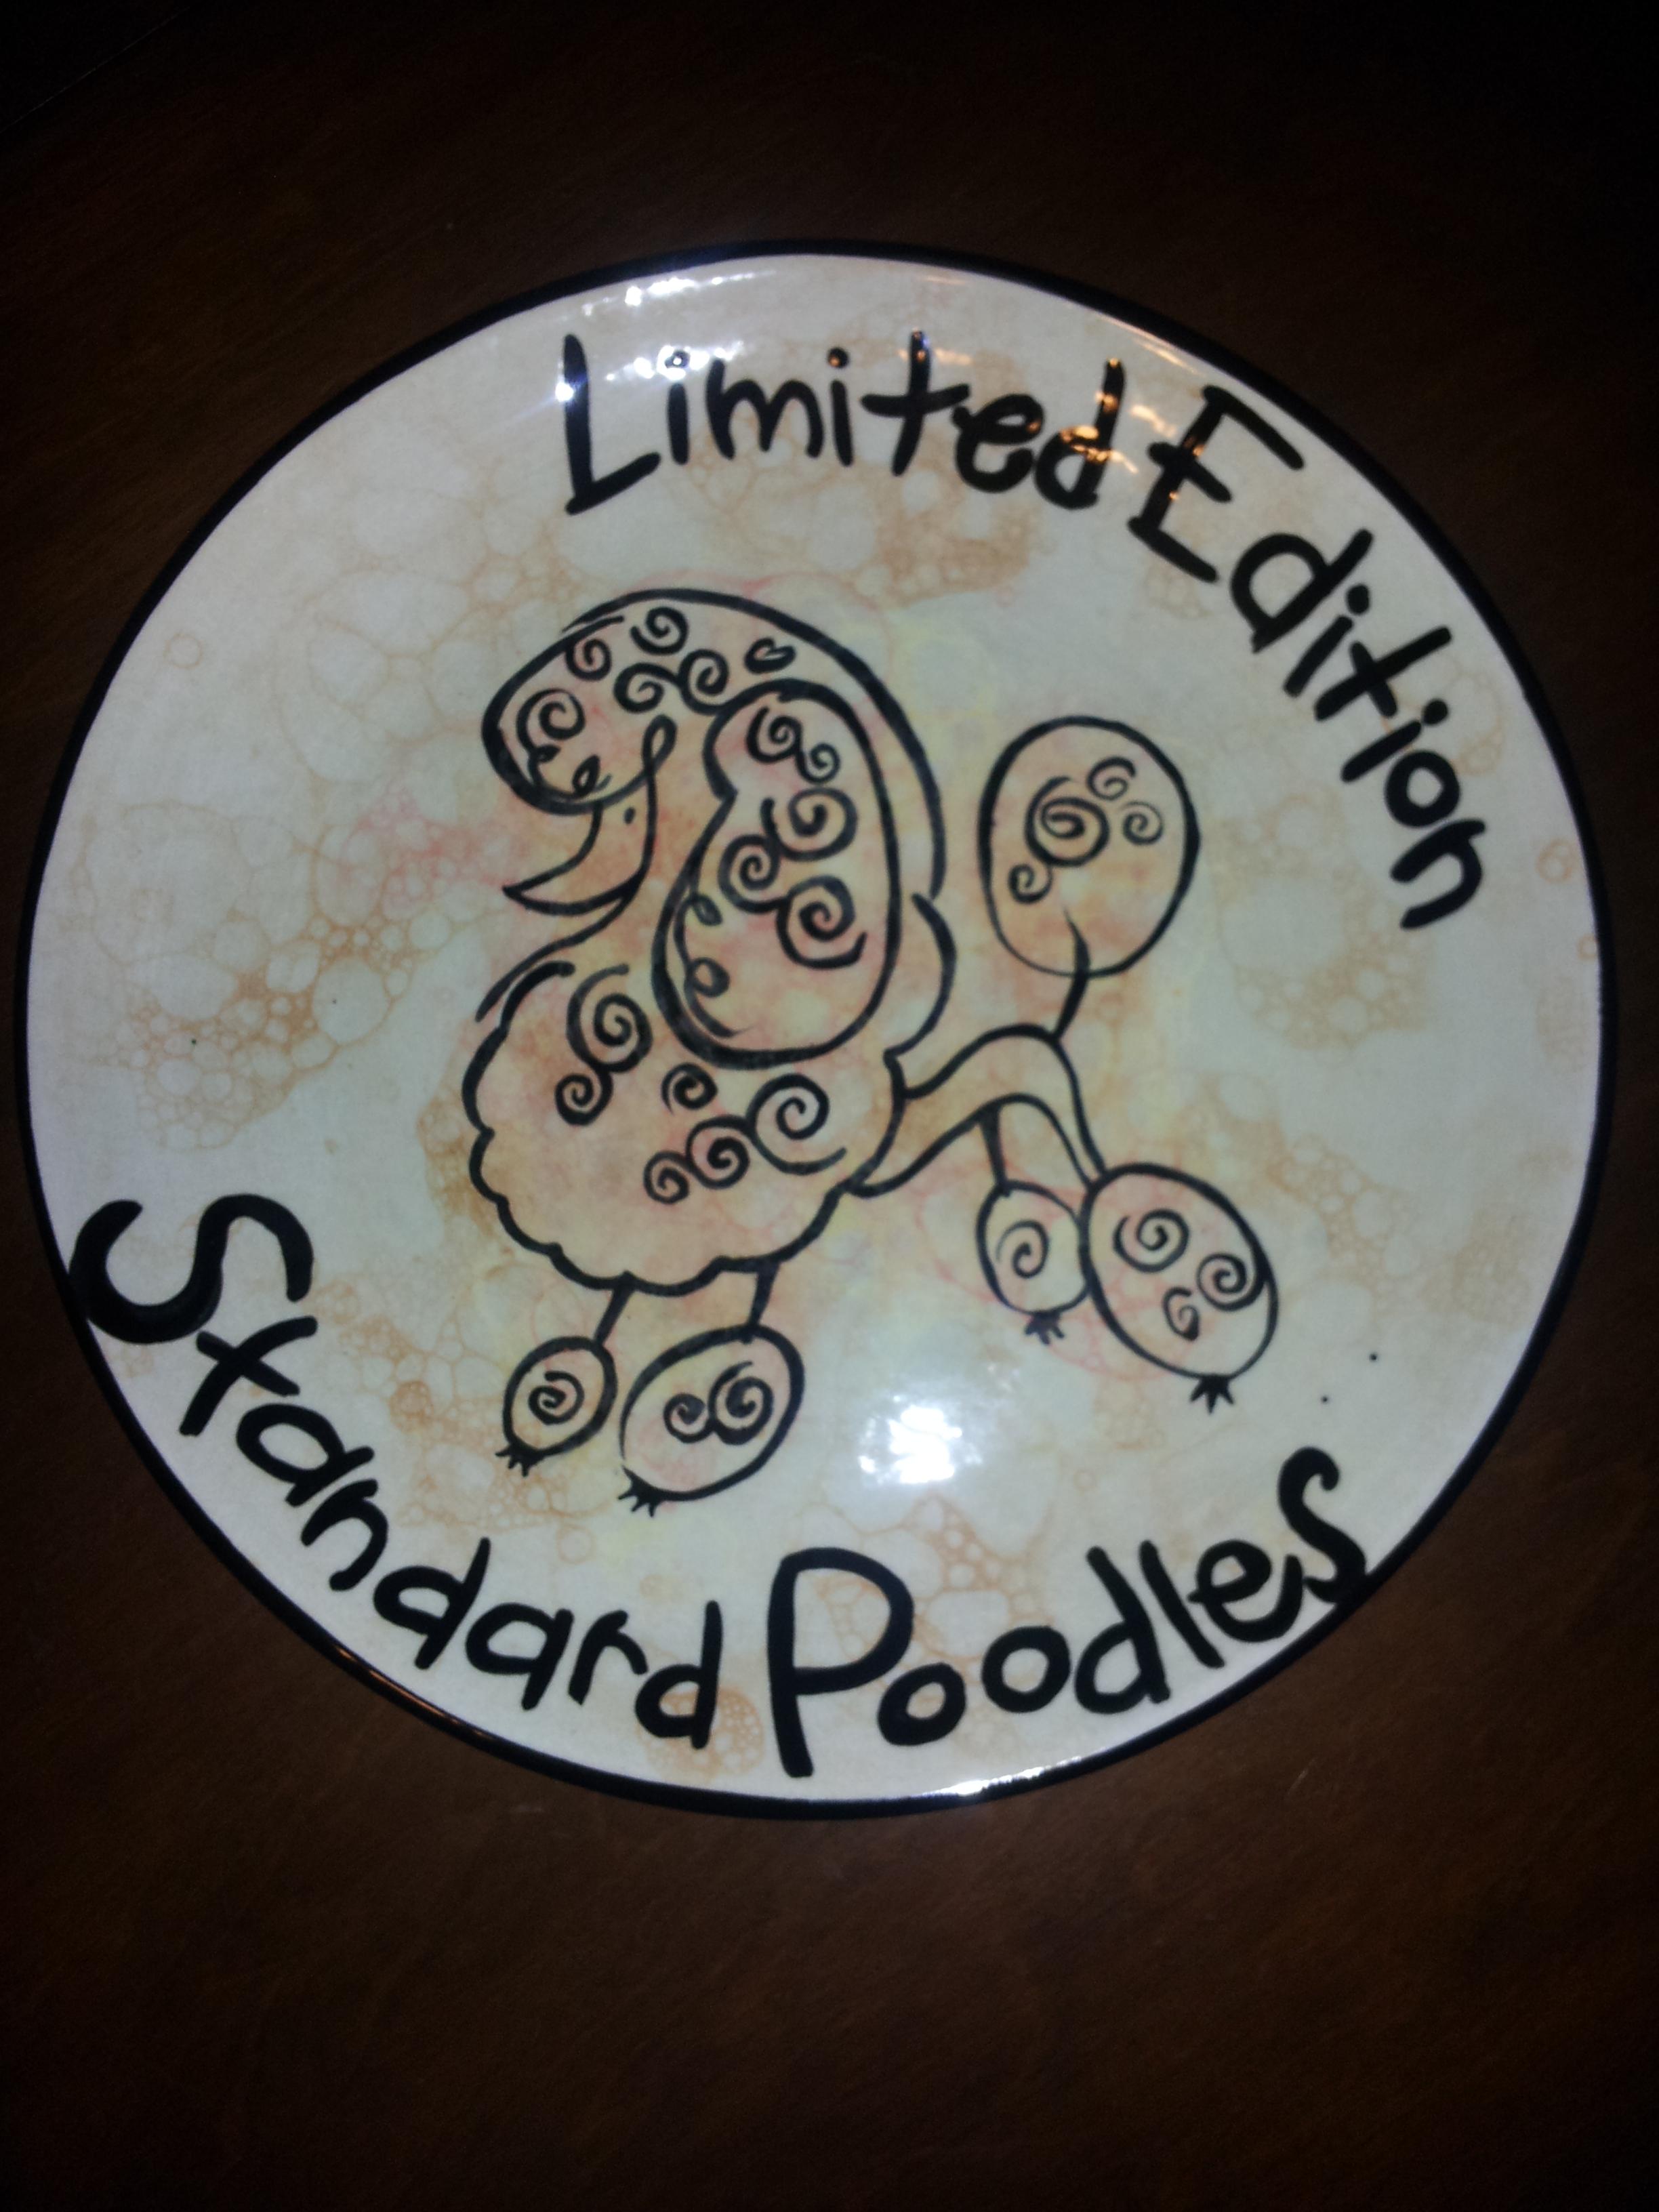 Ltd Edition Plate.jpg